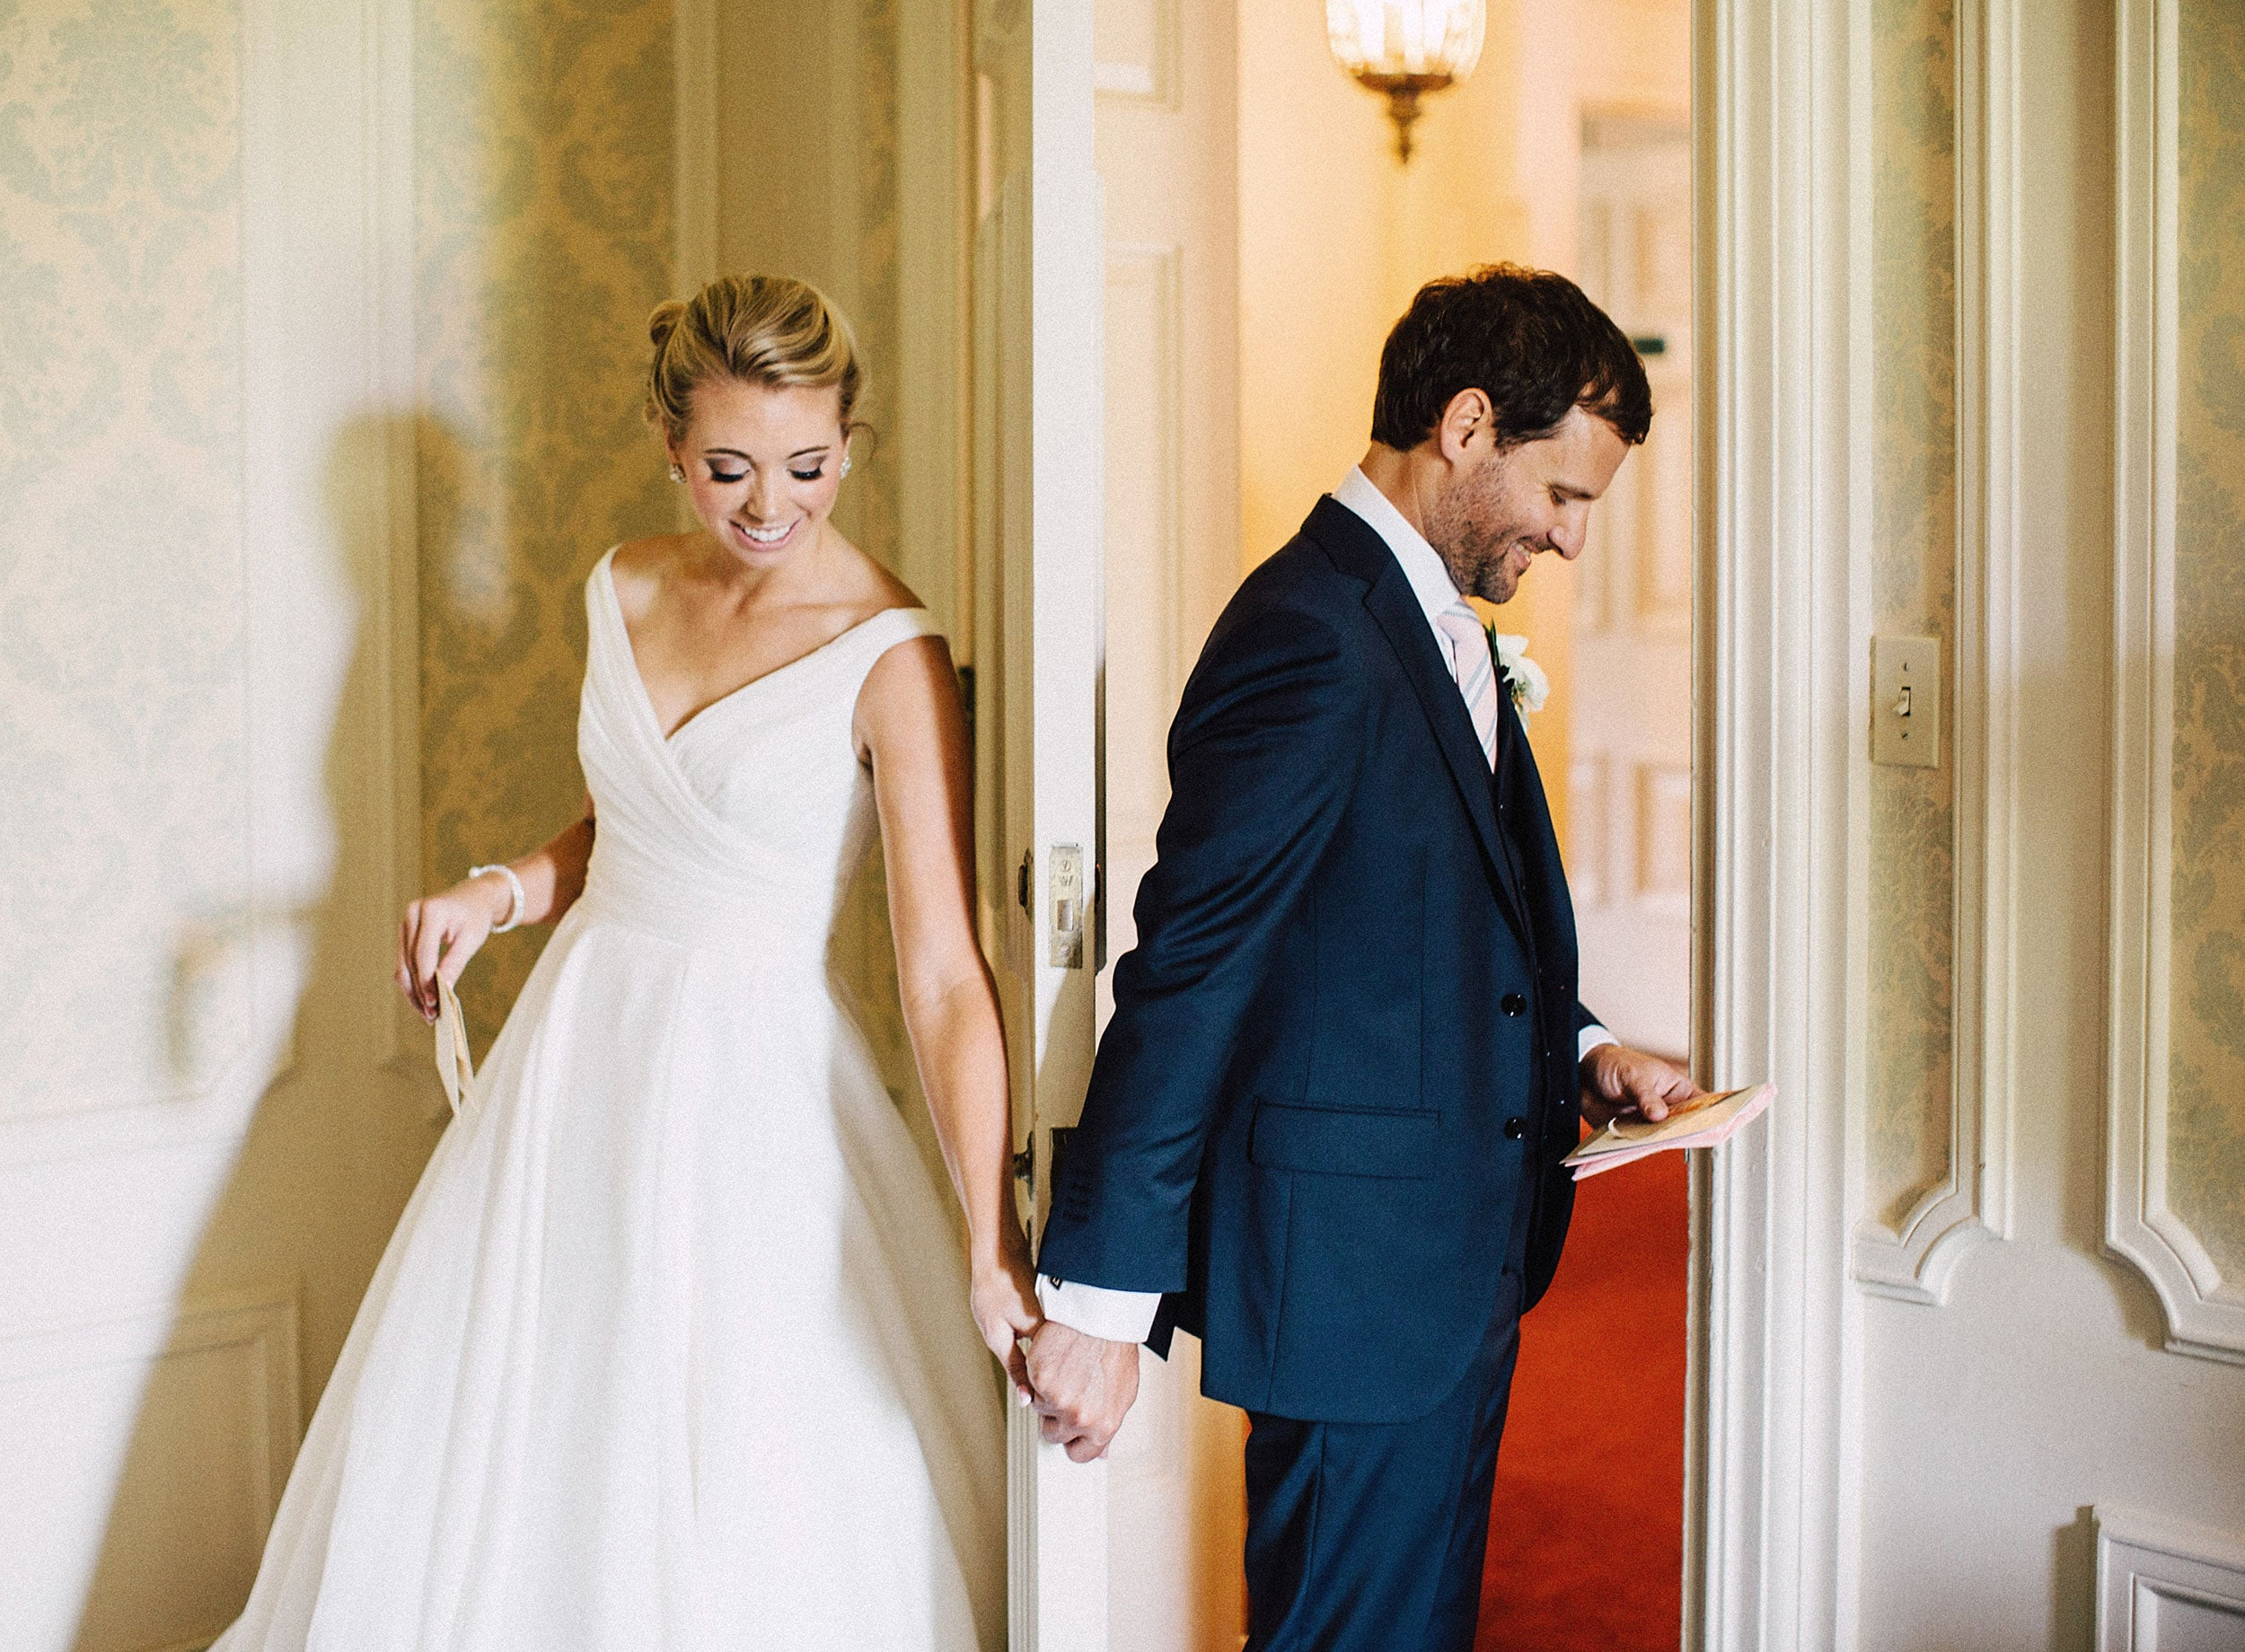 spindletop-lexington-wedding-photographer-019.JPG